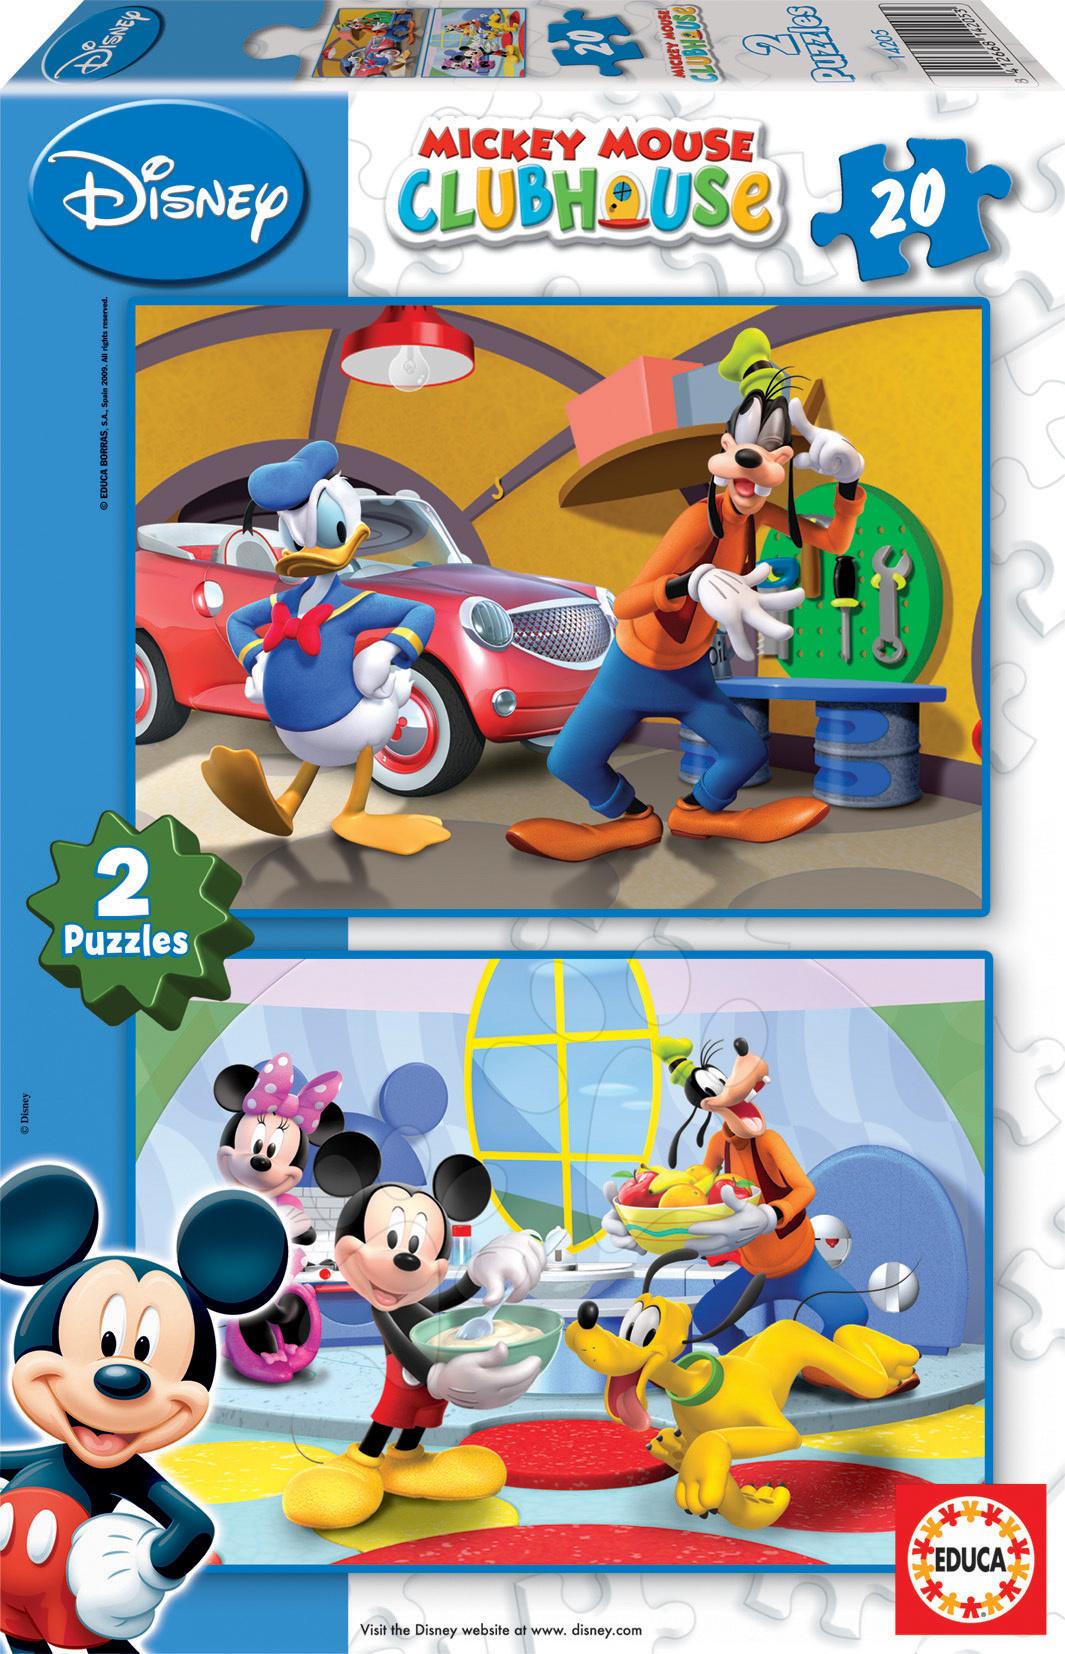 Detské puzzle do 100 dielov - Puzzle Disney Goofy Educa 2x 20 dielov